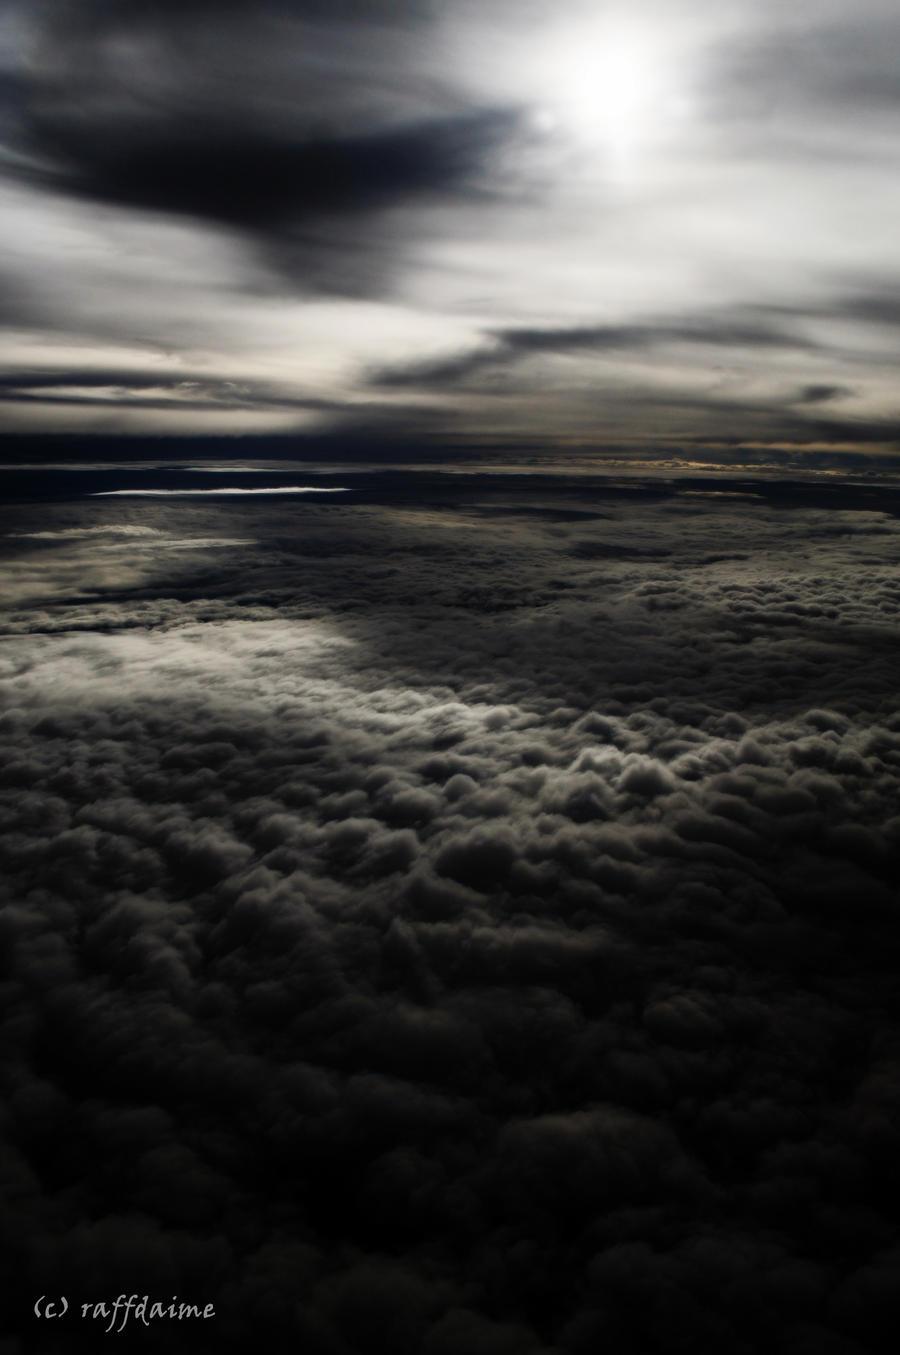 Darkness by raffdaime